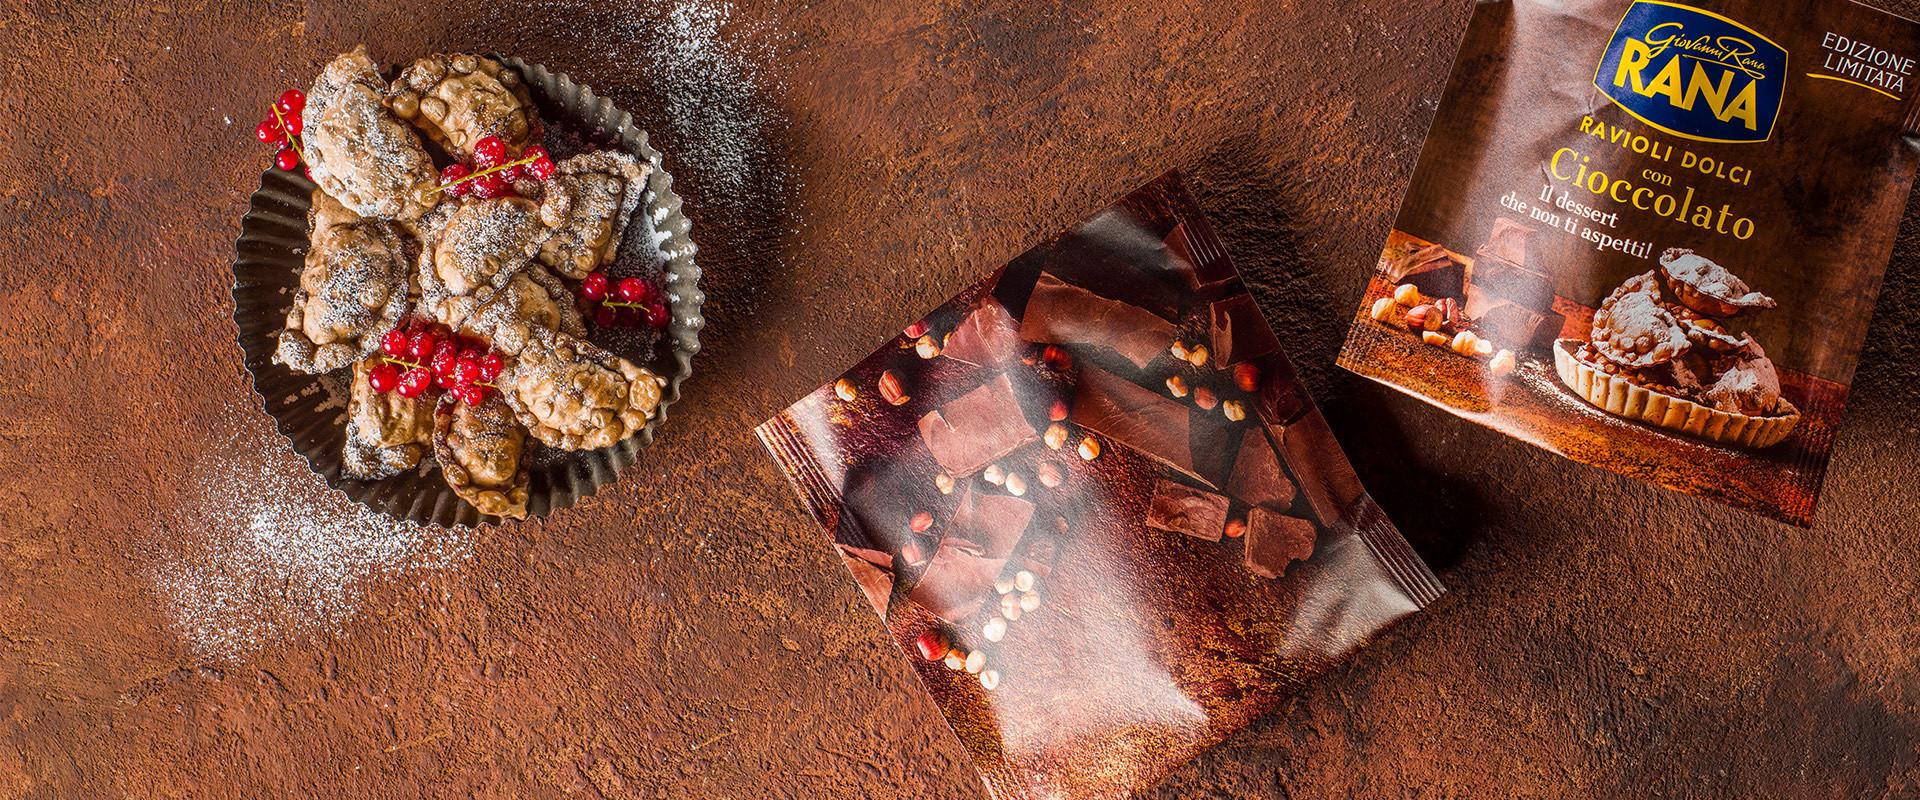 IT-ricette-ravioli-cioccolato-ribes-D.jpg